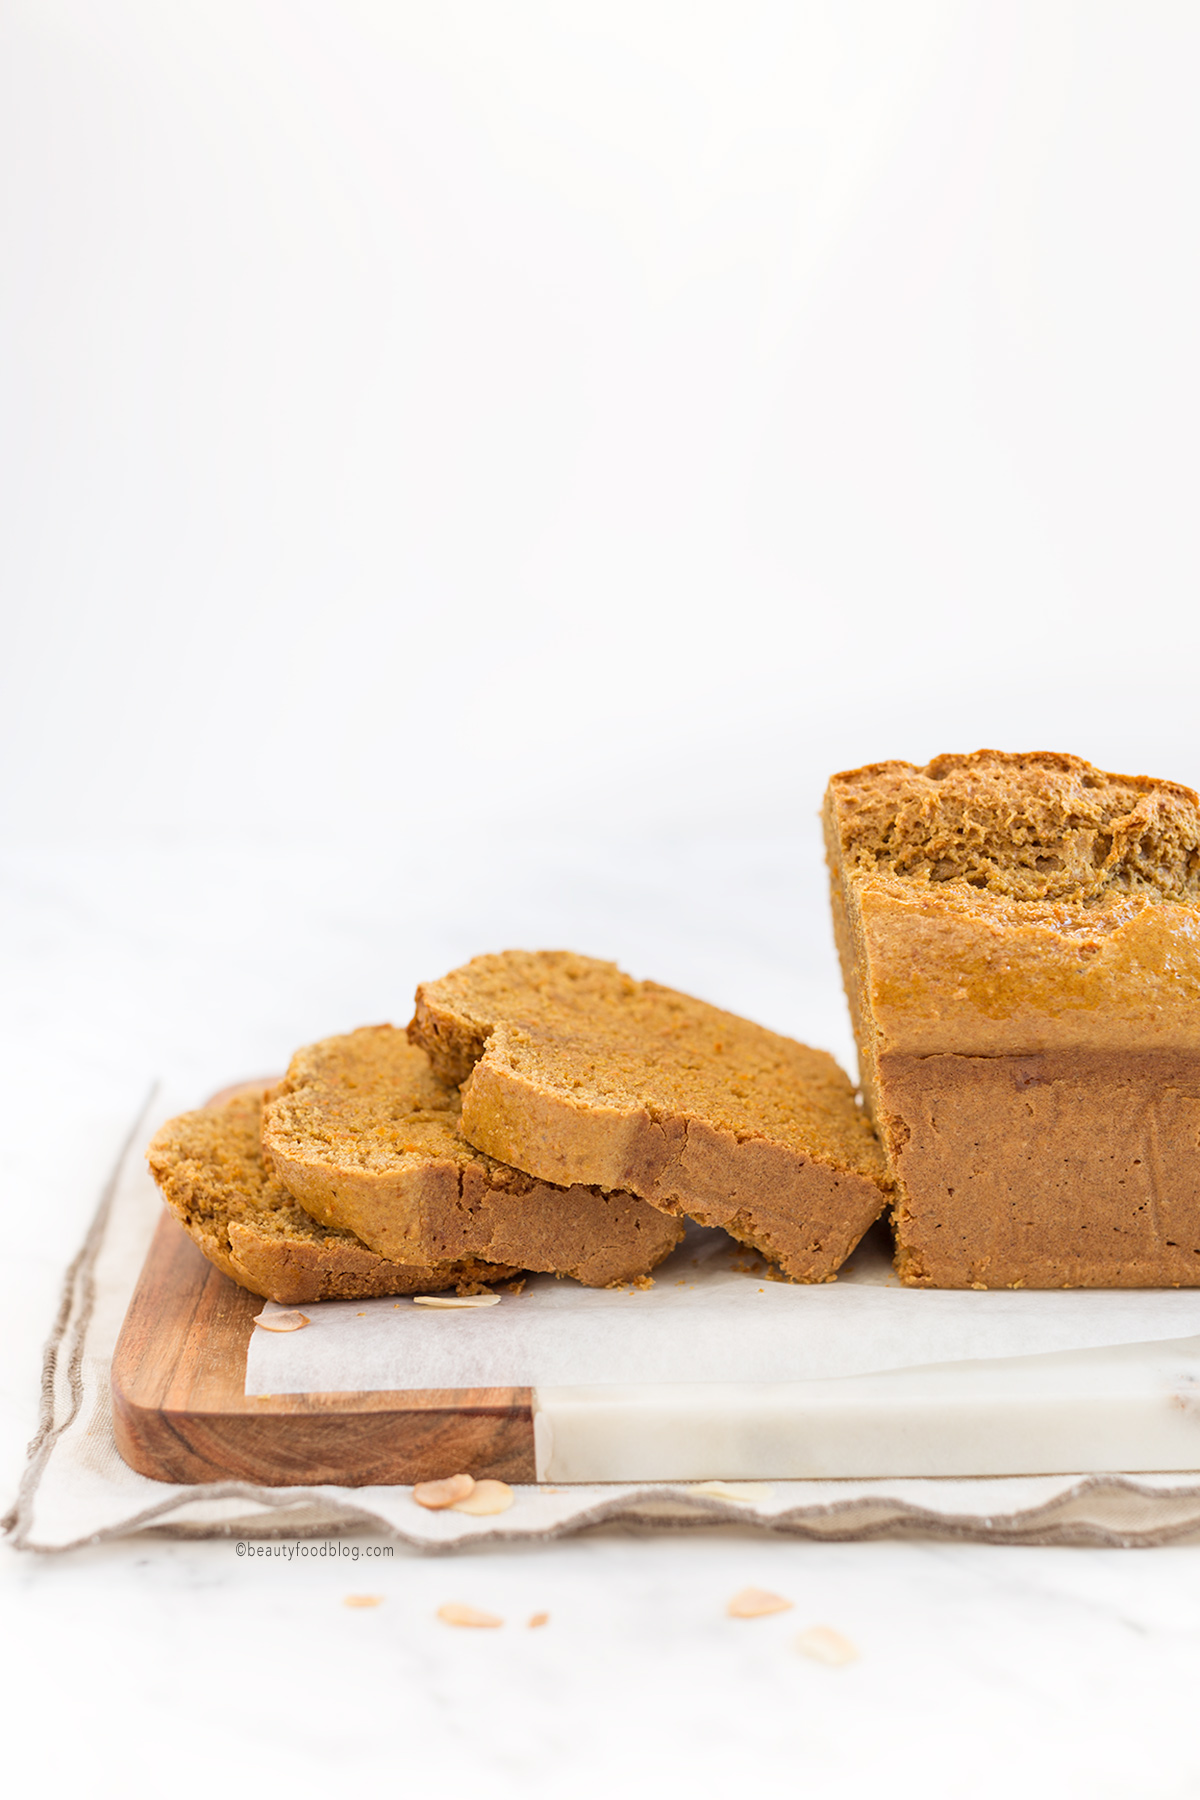 wholemeal spelt vegan carrot almond loaf cake recipe - ricetta plumcake vegan alle carote e mandorle di farro integrale